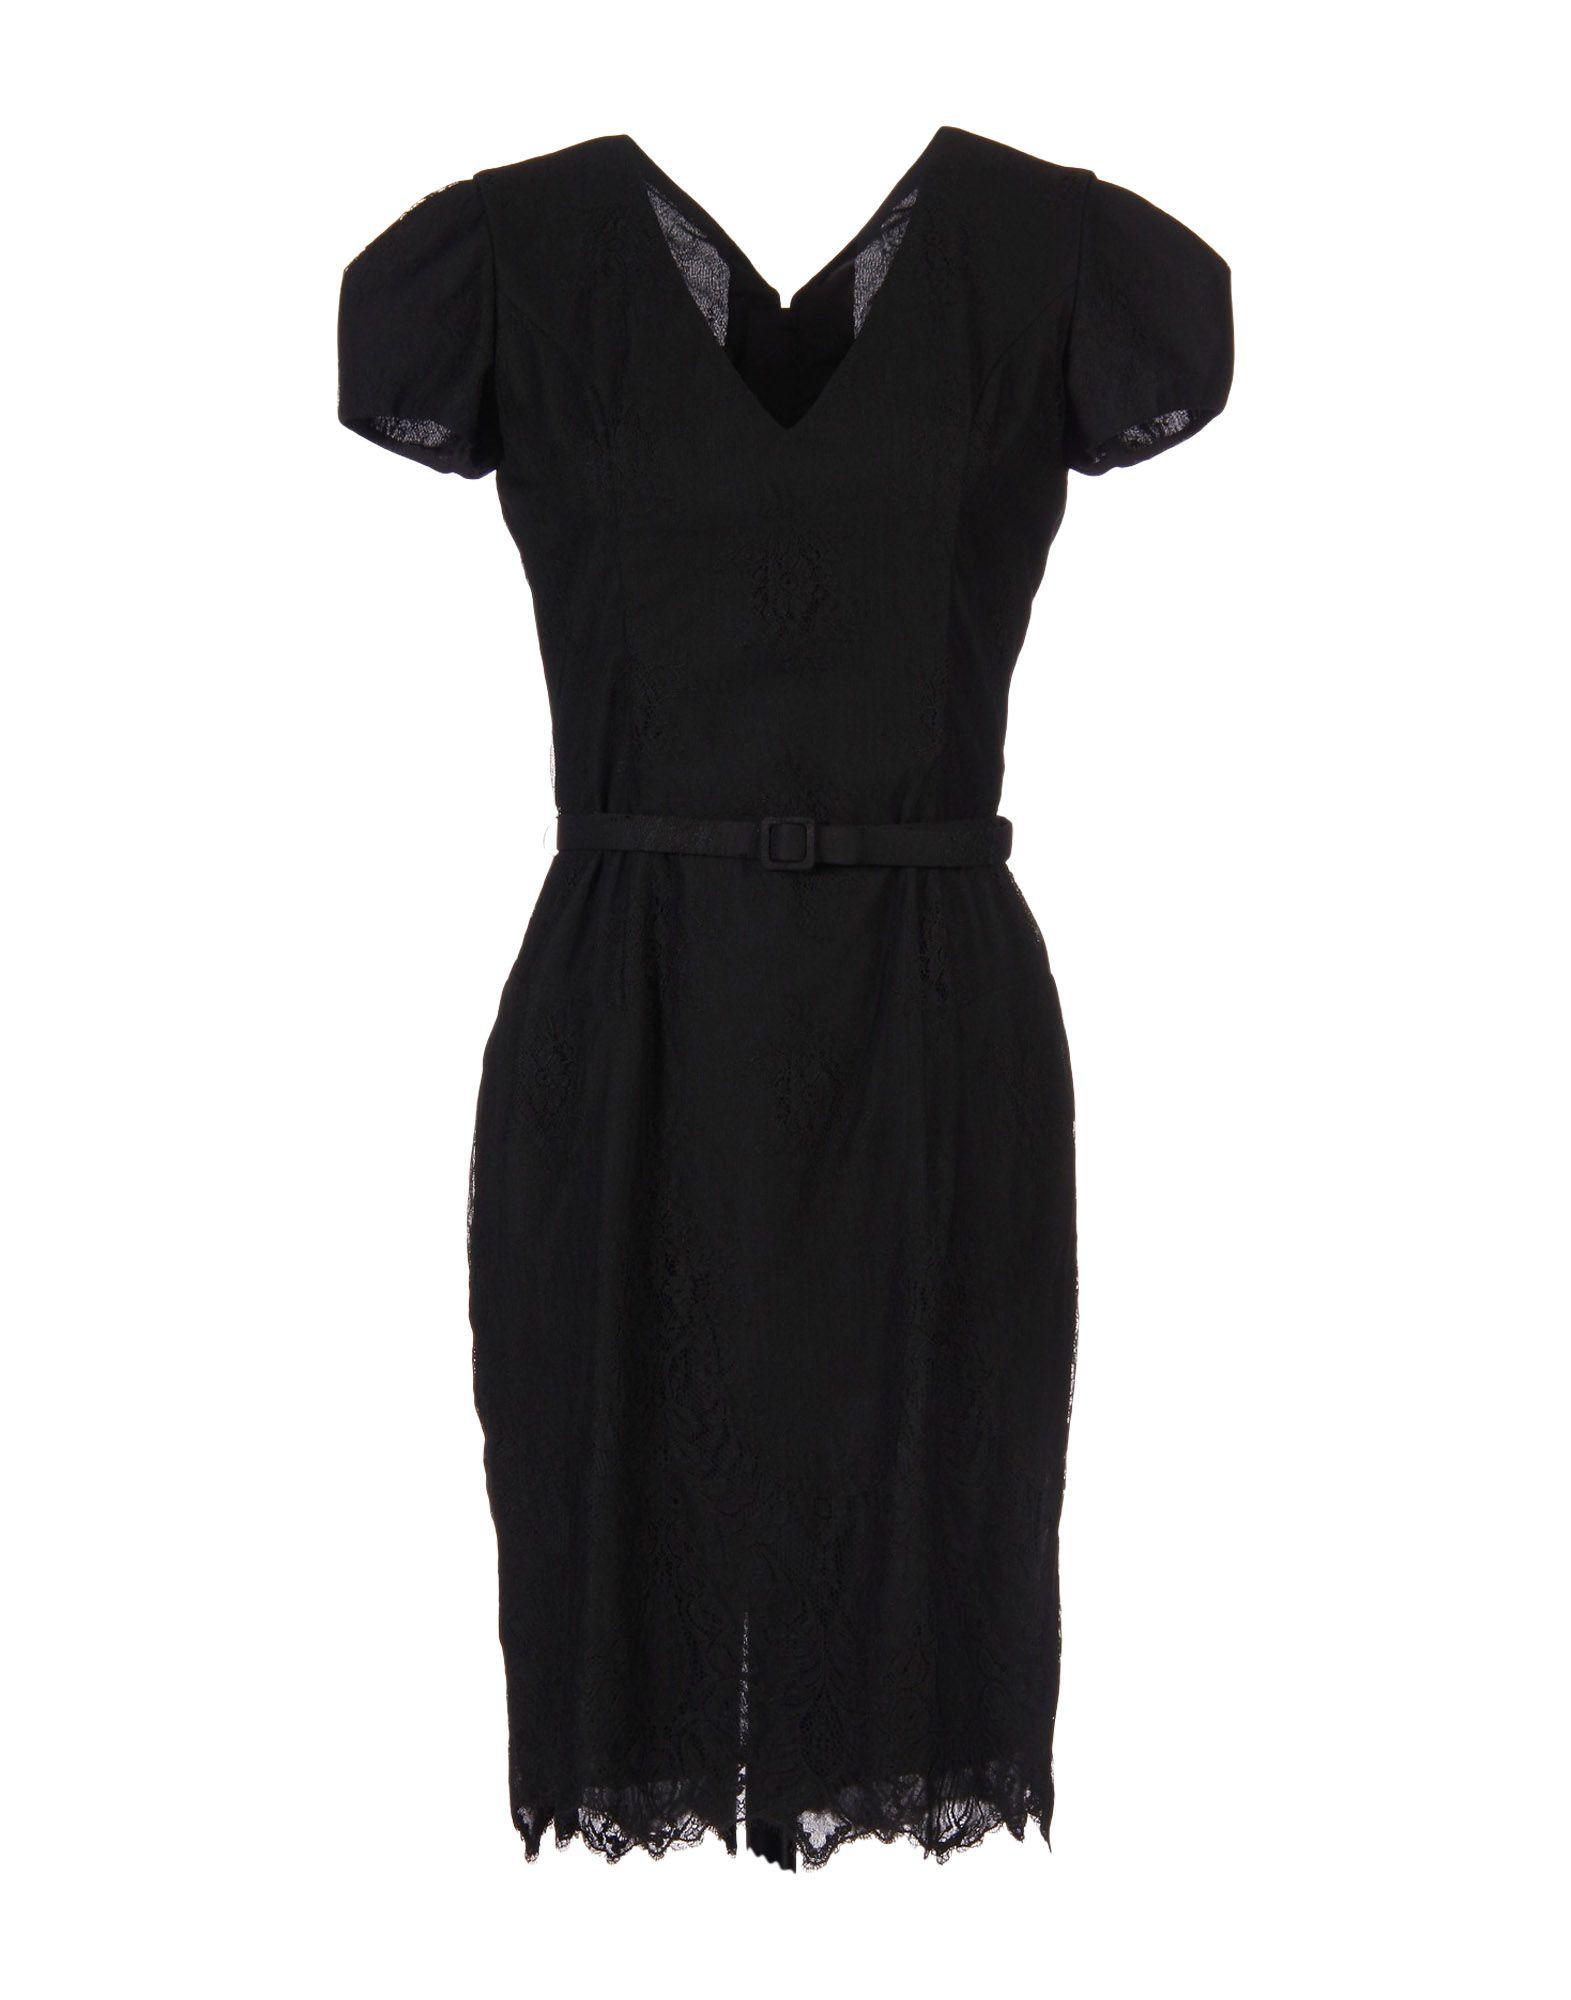 L'WREN SCOTT Short Dress in Black